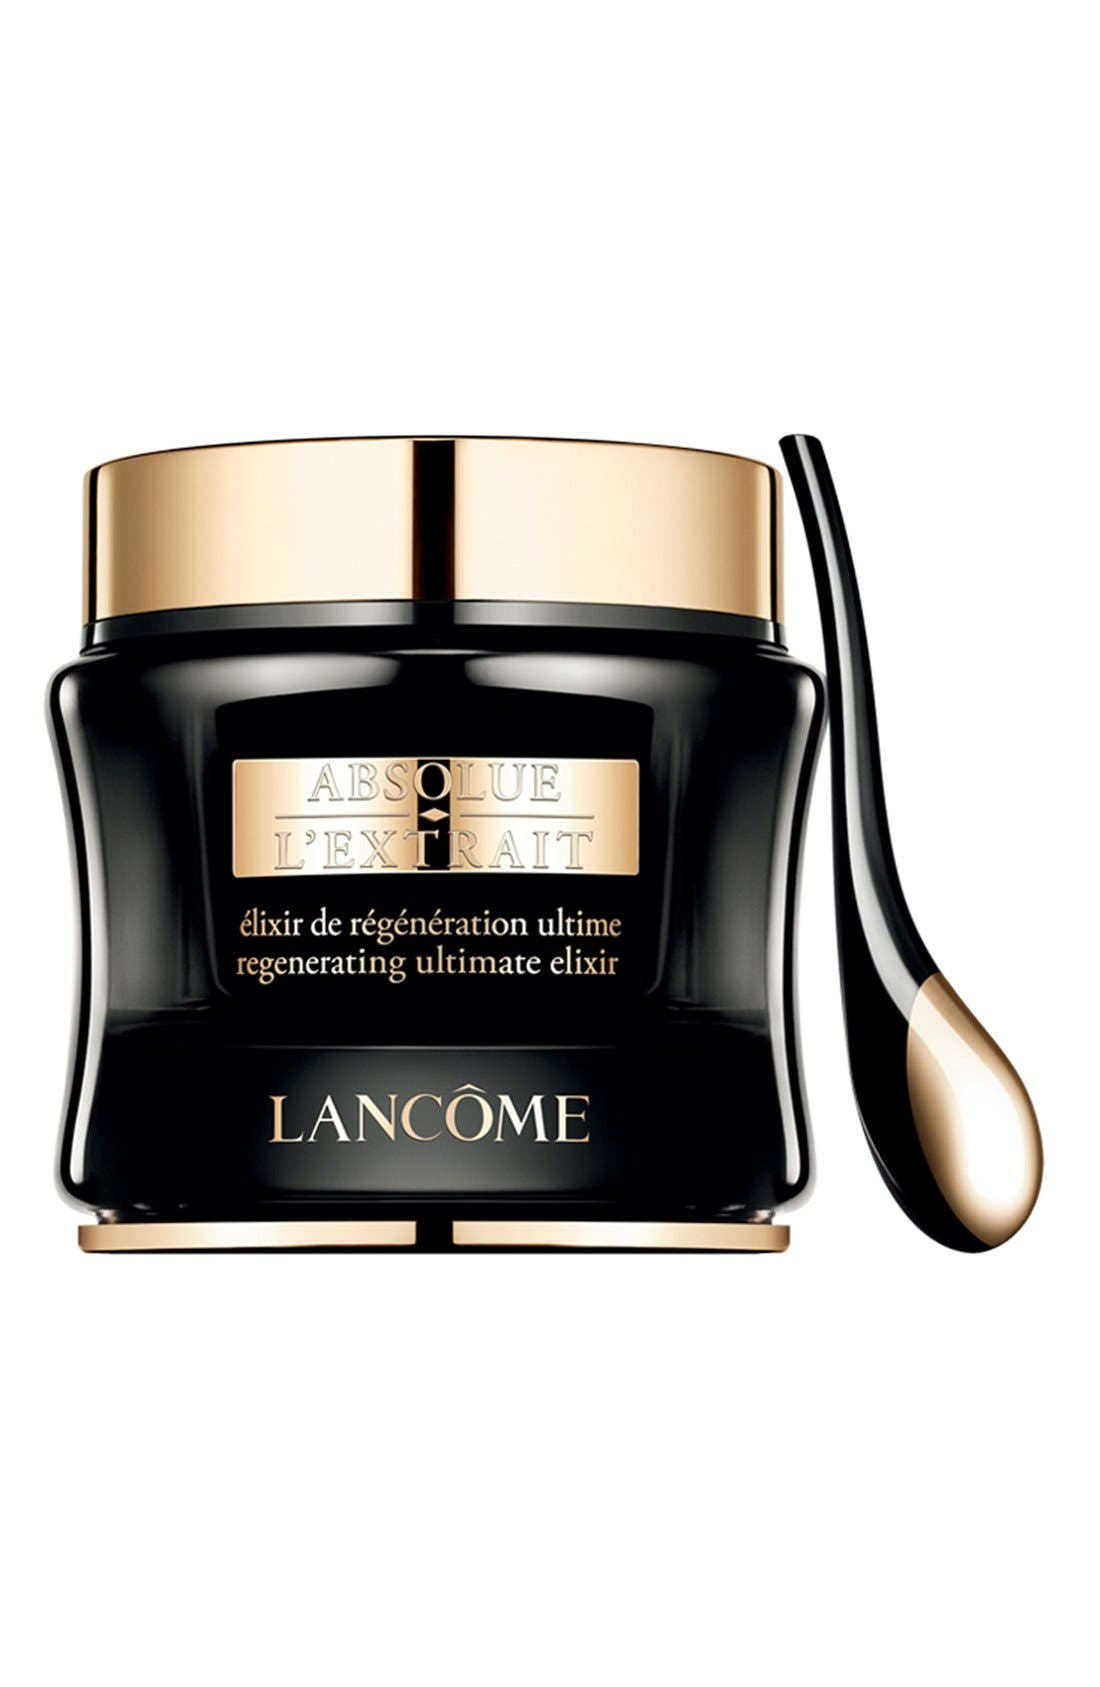 Lancôme Absolue LExtrait Regenerating Ultimate Elixir